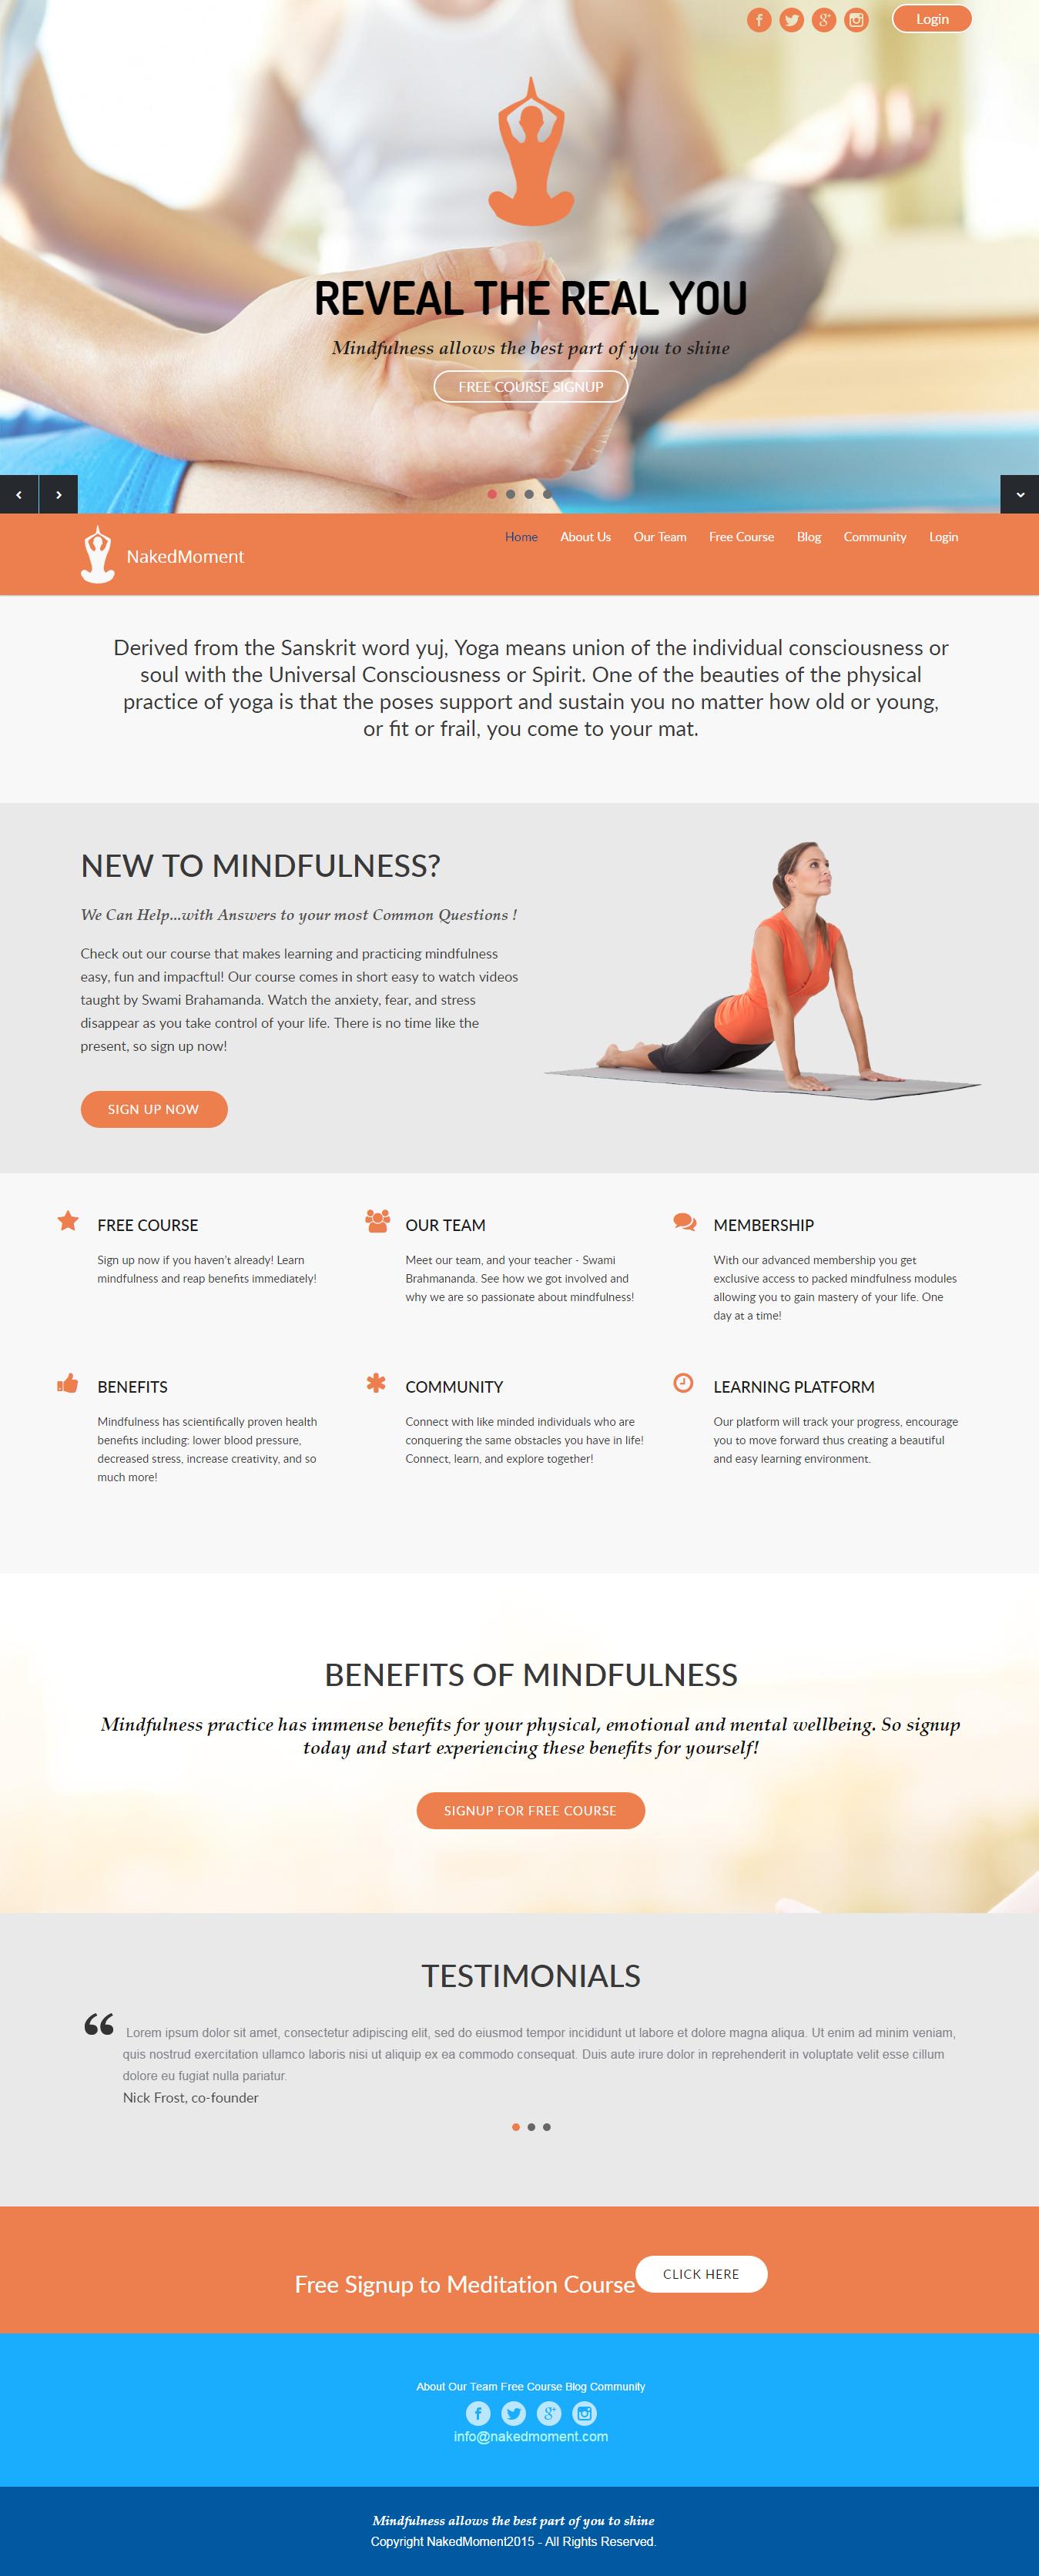 http://122.176.26.69:85/yoga/